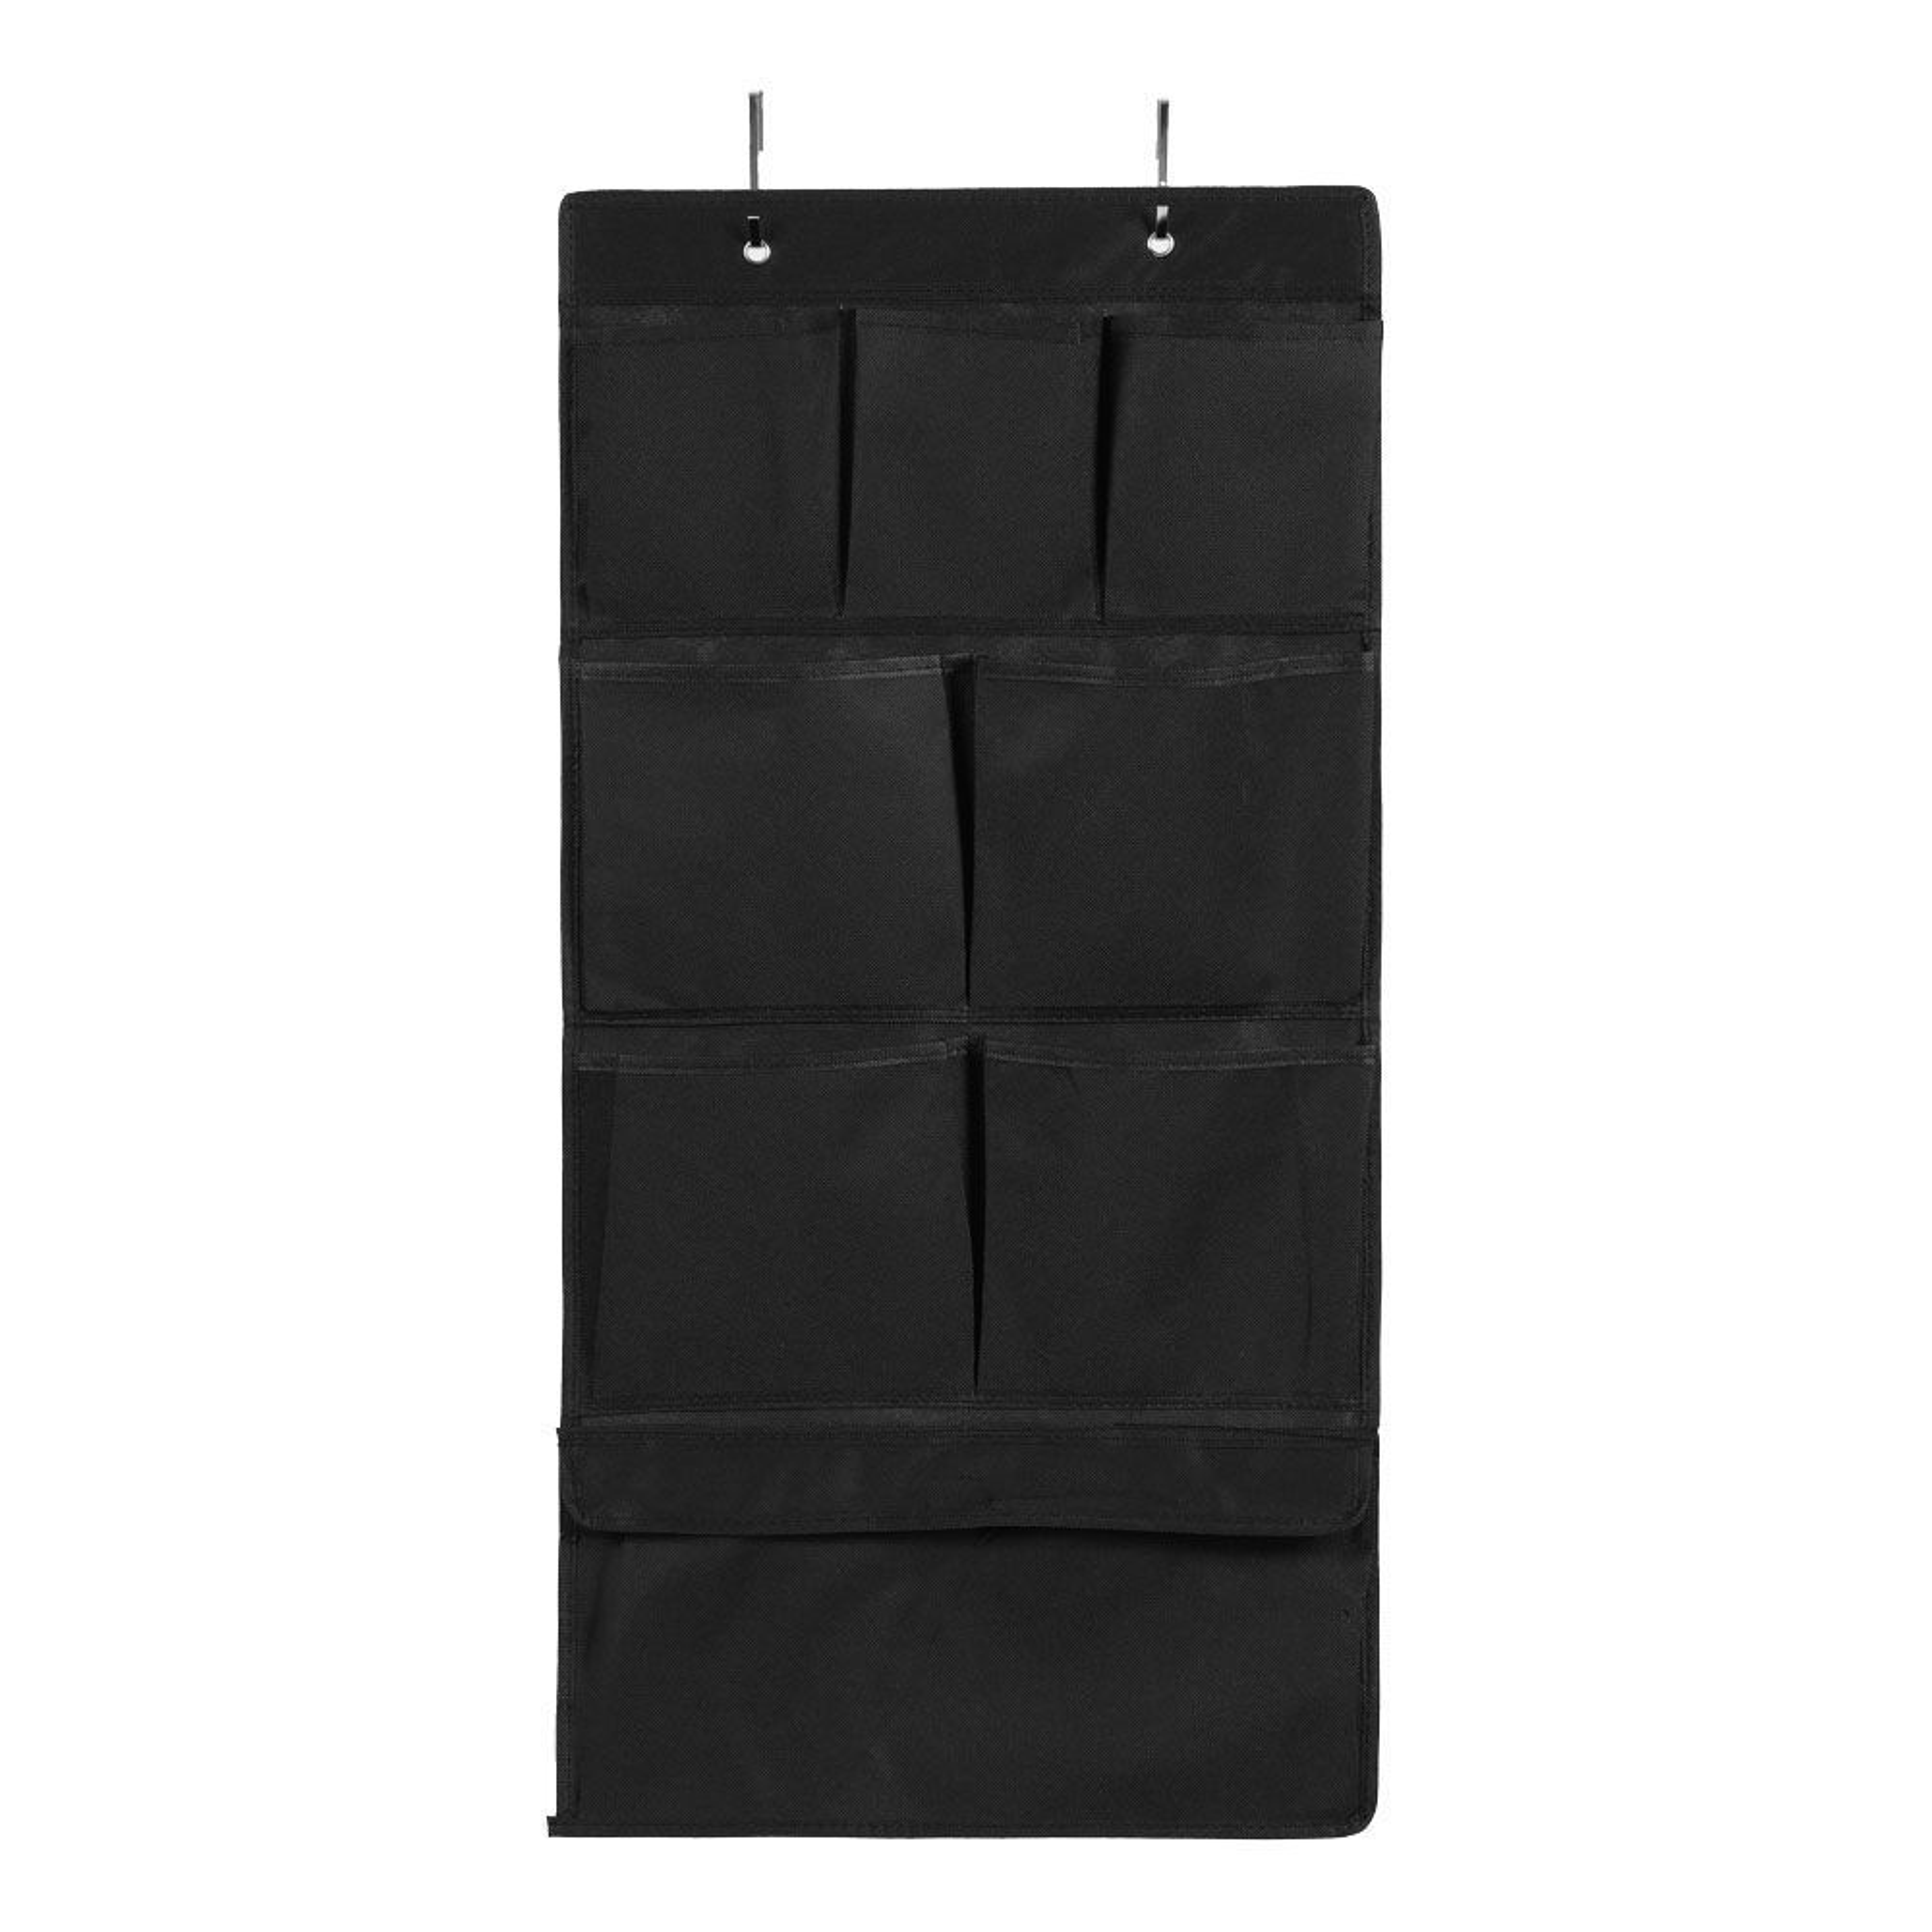 Mode Soft Storage 8 Pocket Hanging Wardrobe Black 40 x 80cm | Home Storage & Living